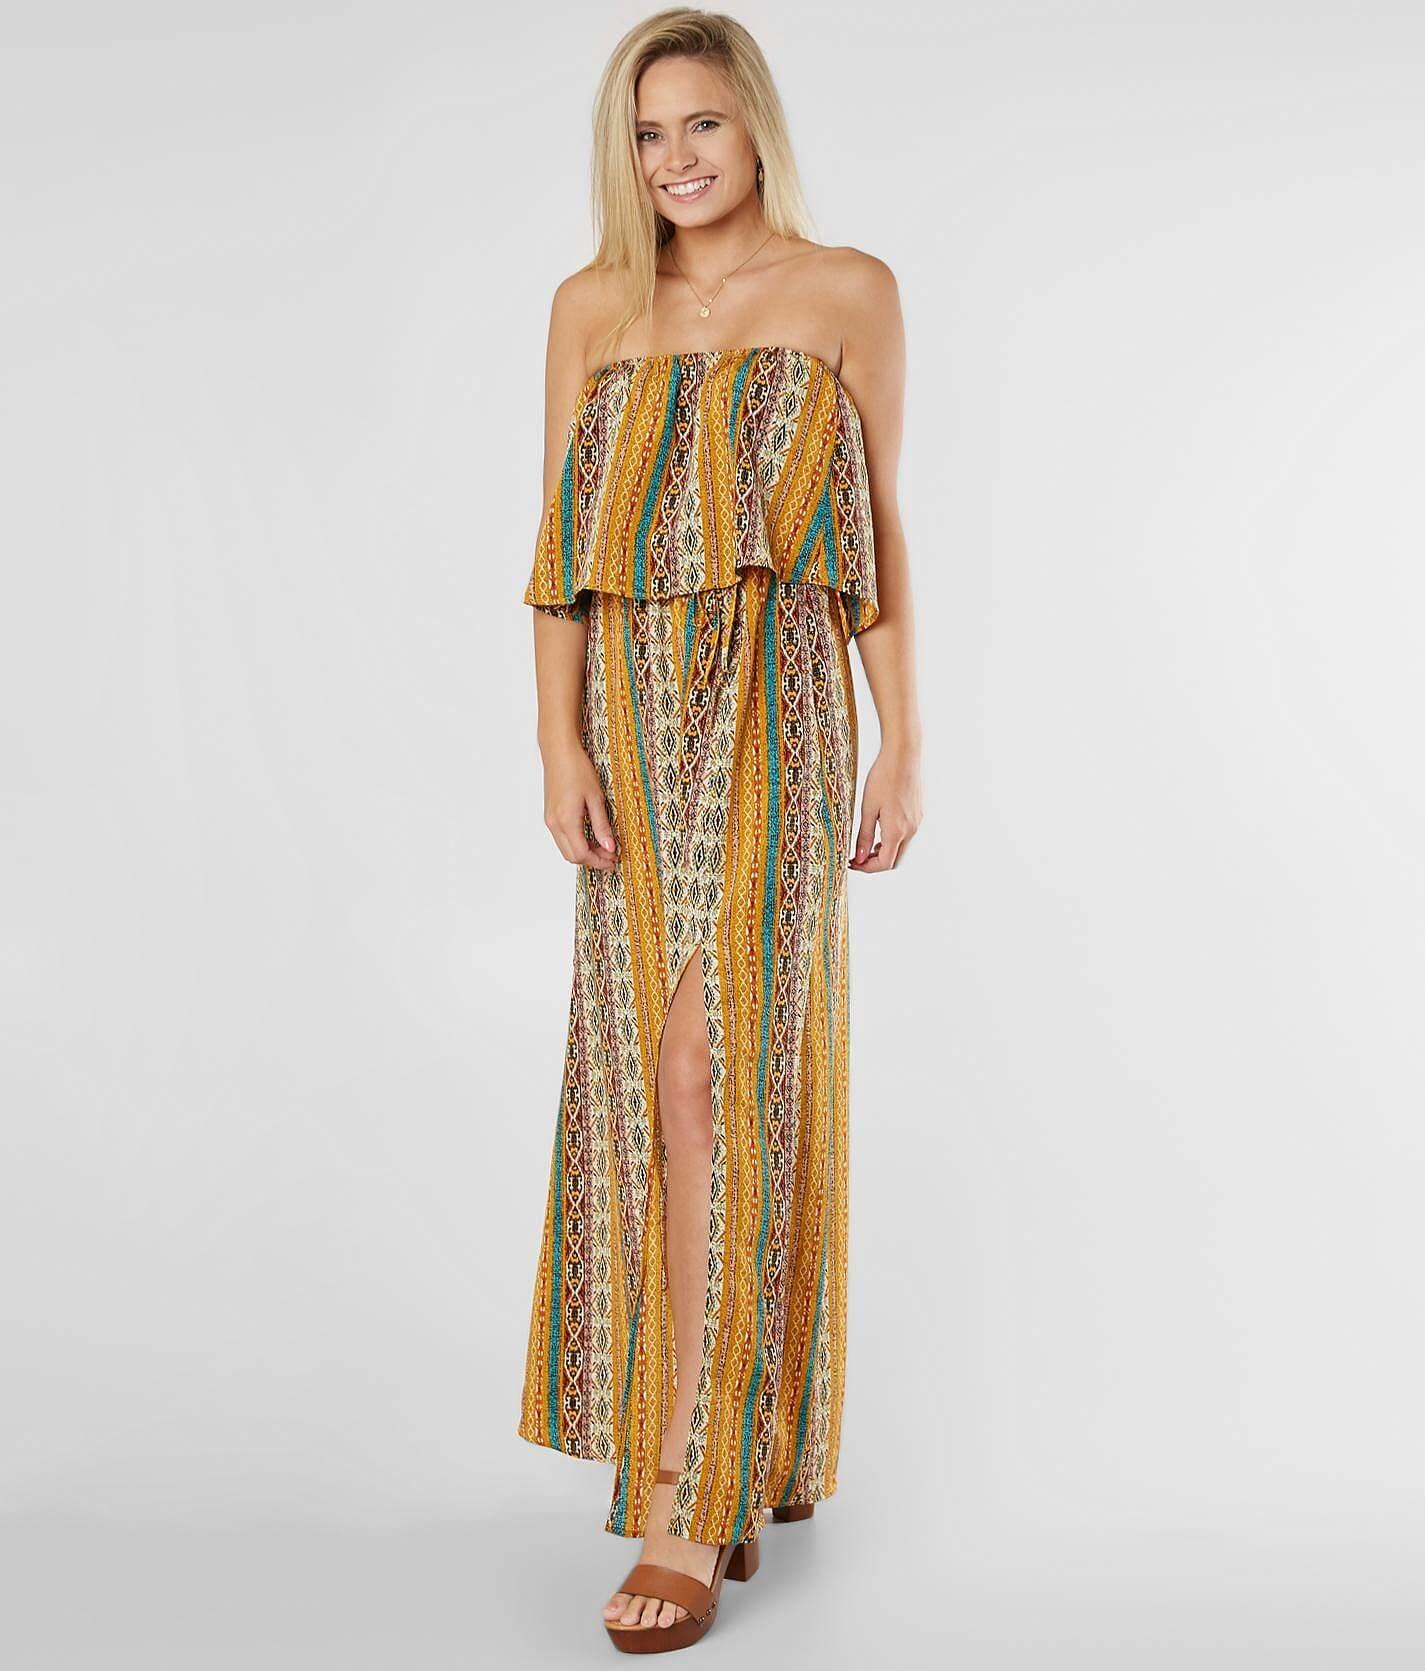 Southwestern Strapless Maxi Dress